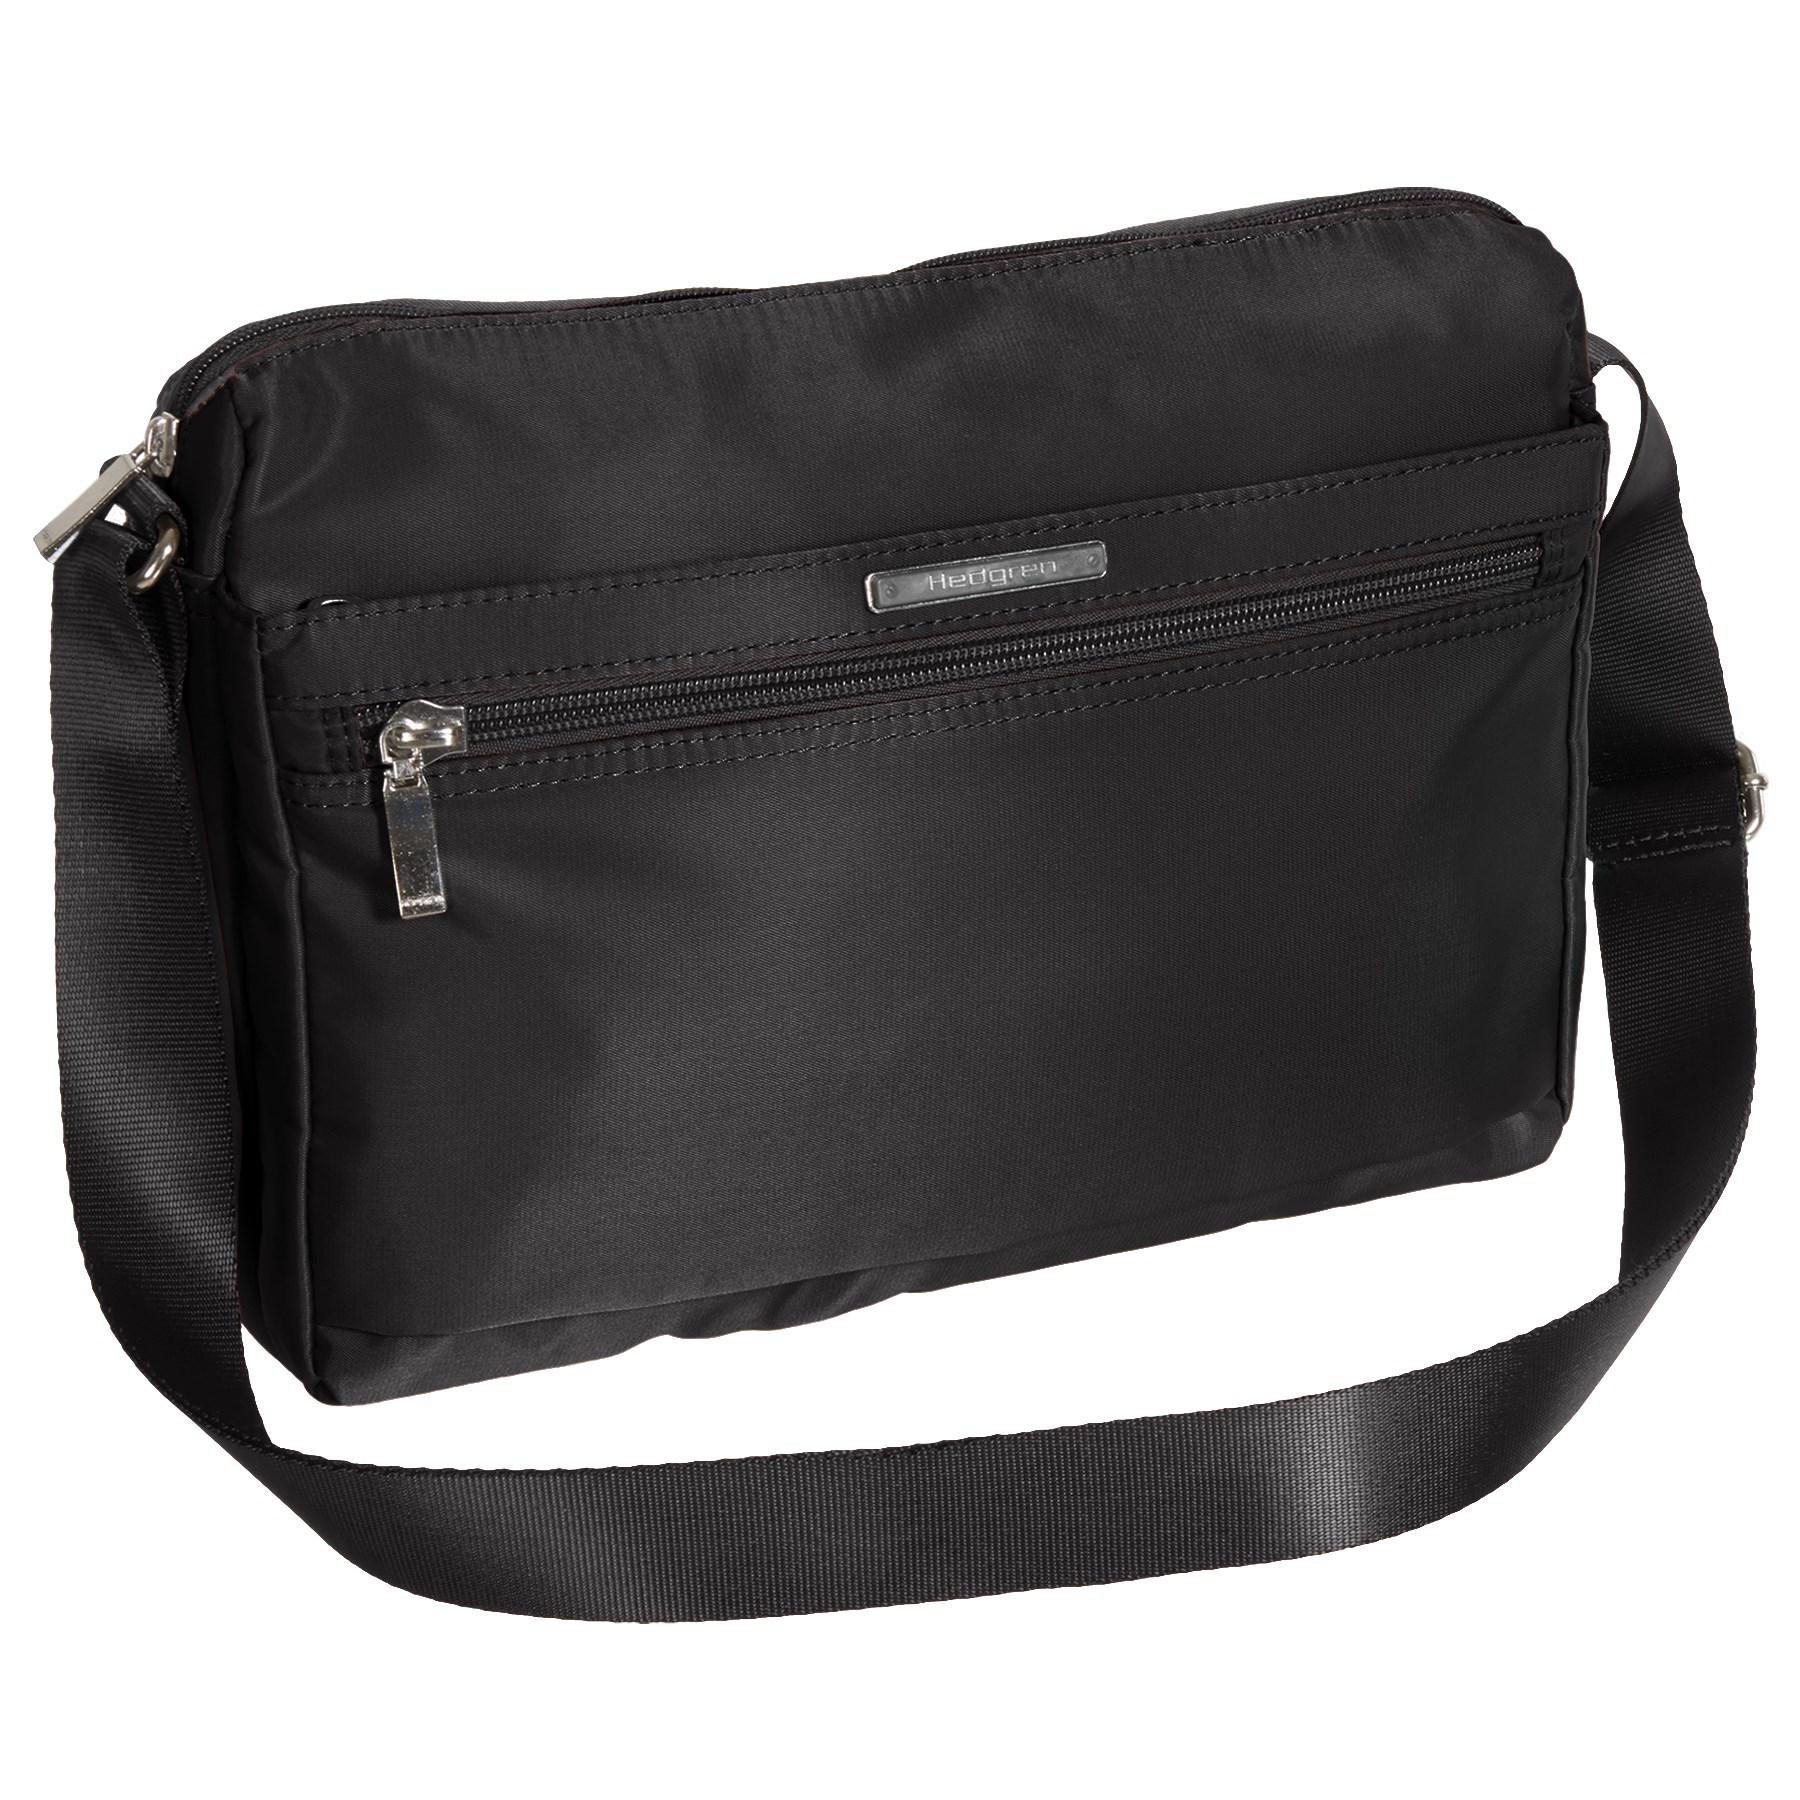 b50a361f23 Lyst - Hedgren Inner City Eye Medium Rfid Crossbody Bag (for Women ...